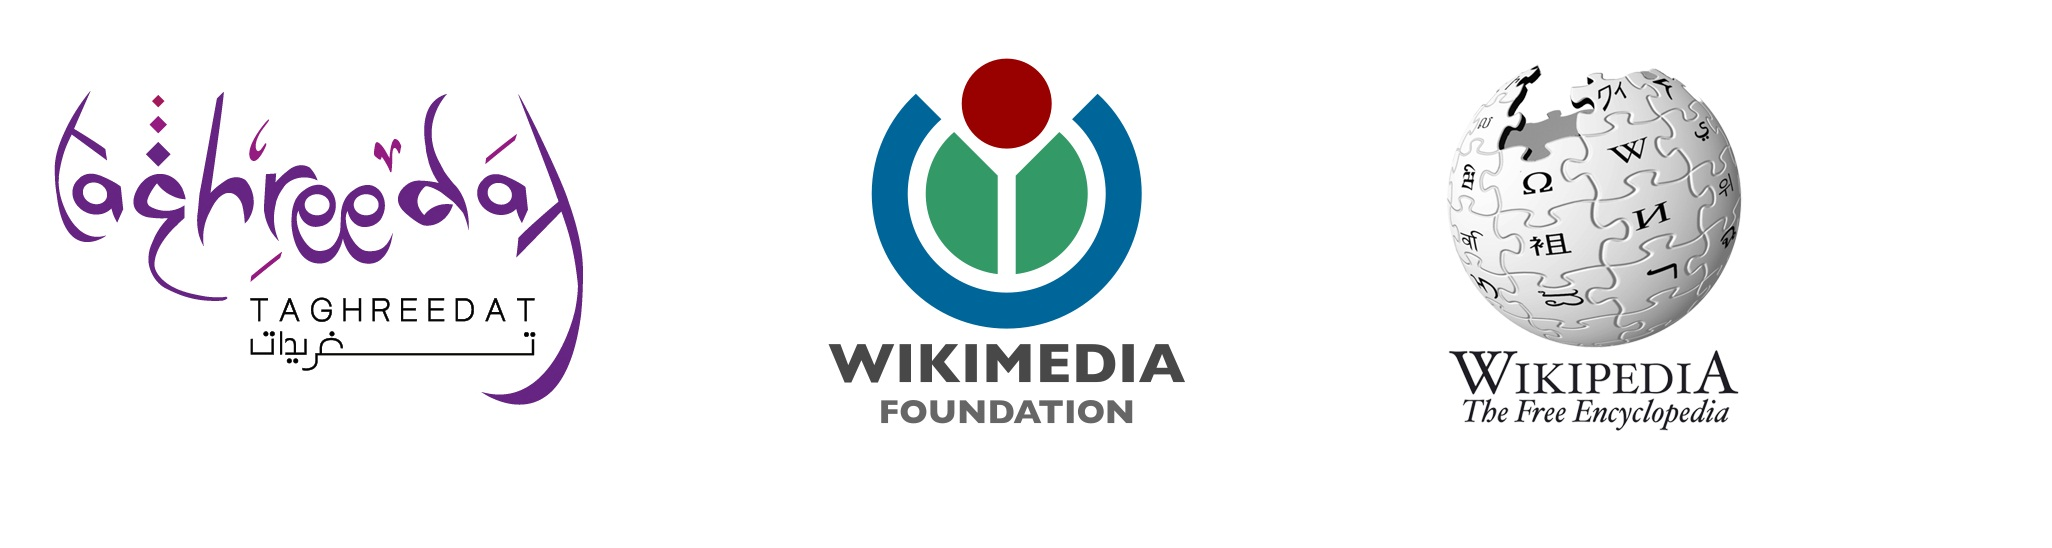 taghreedat-wikimedia-wikipeda-logo-1-jpg